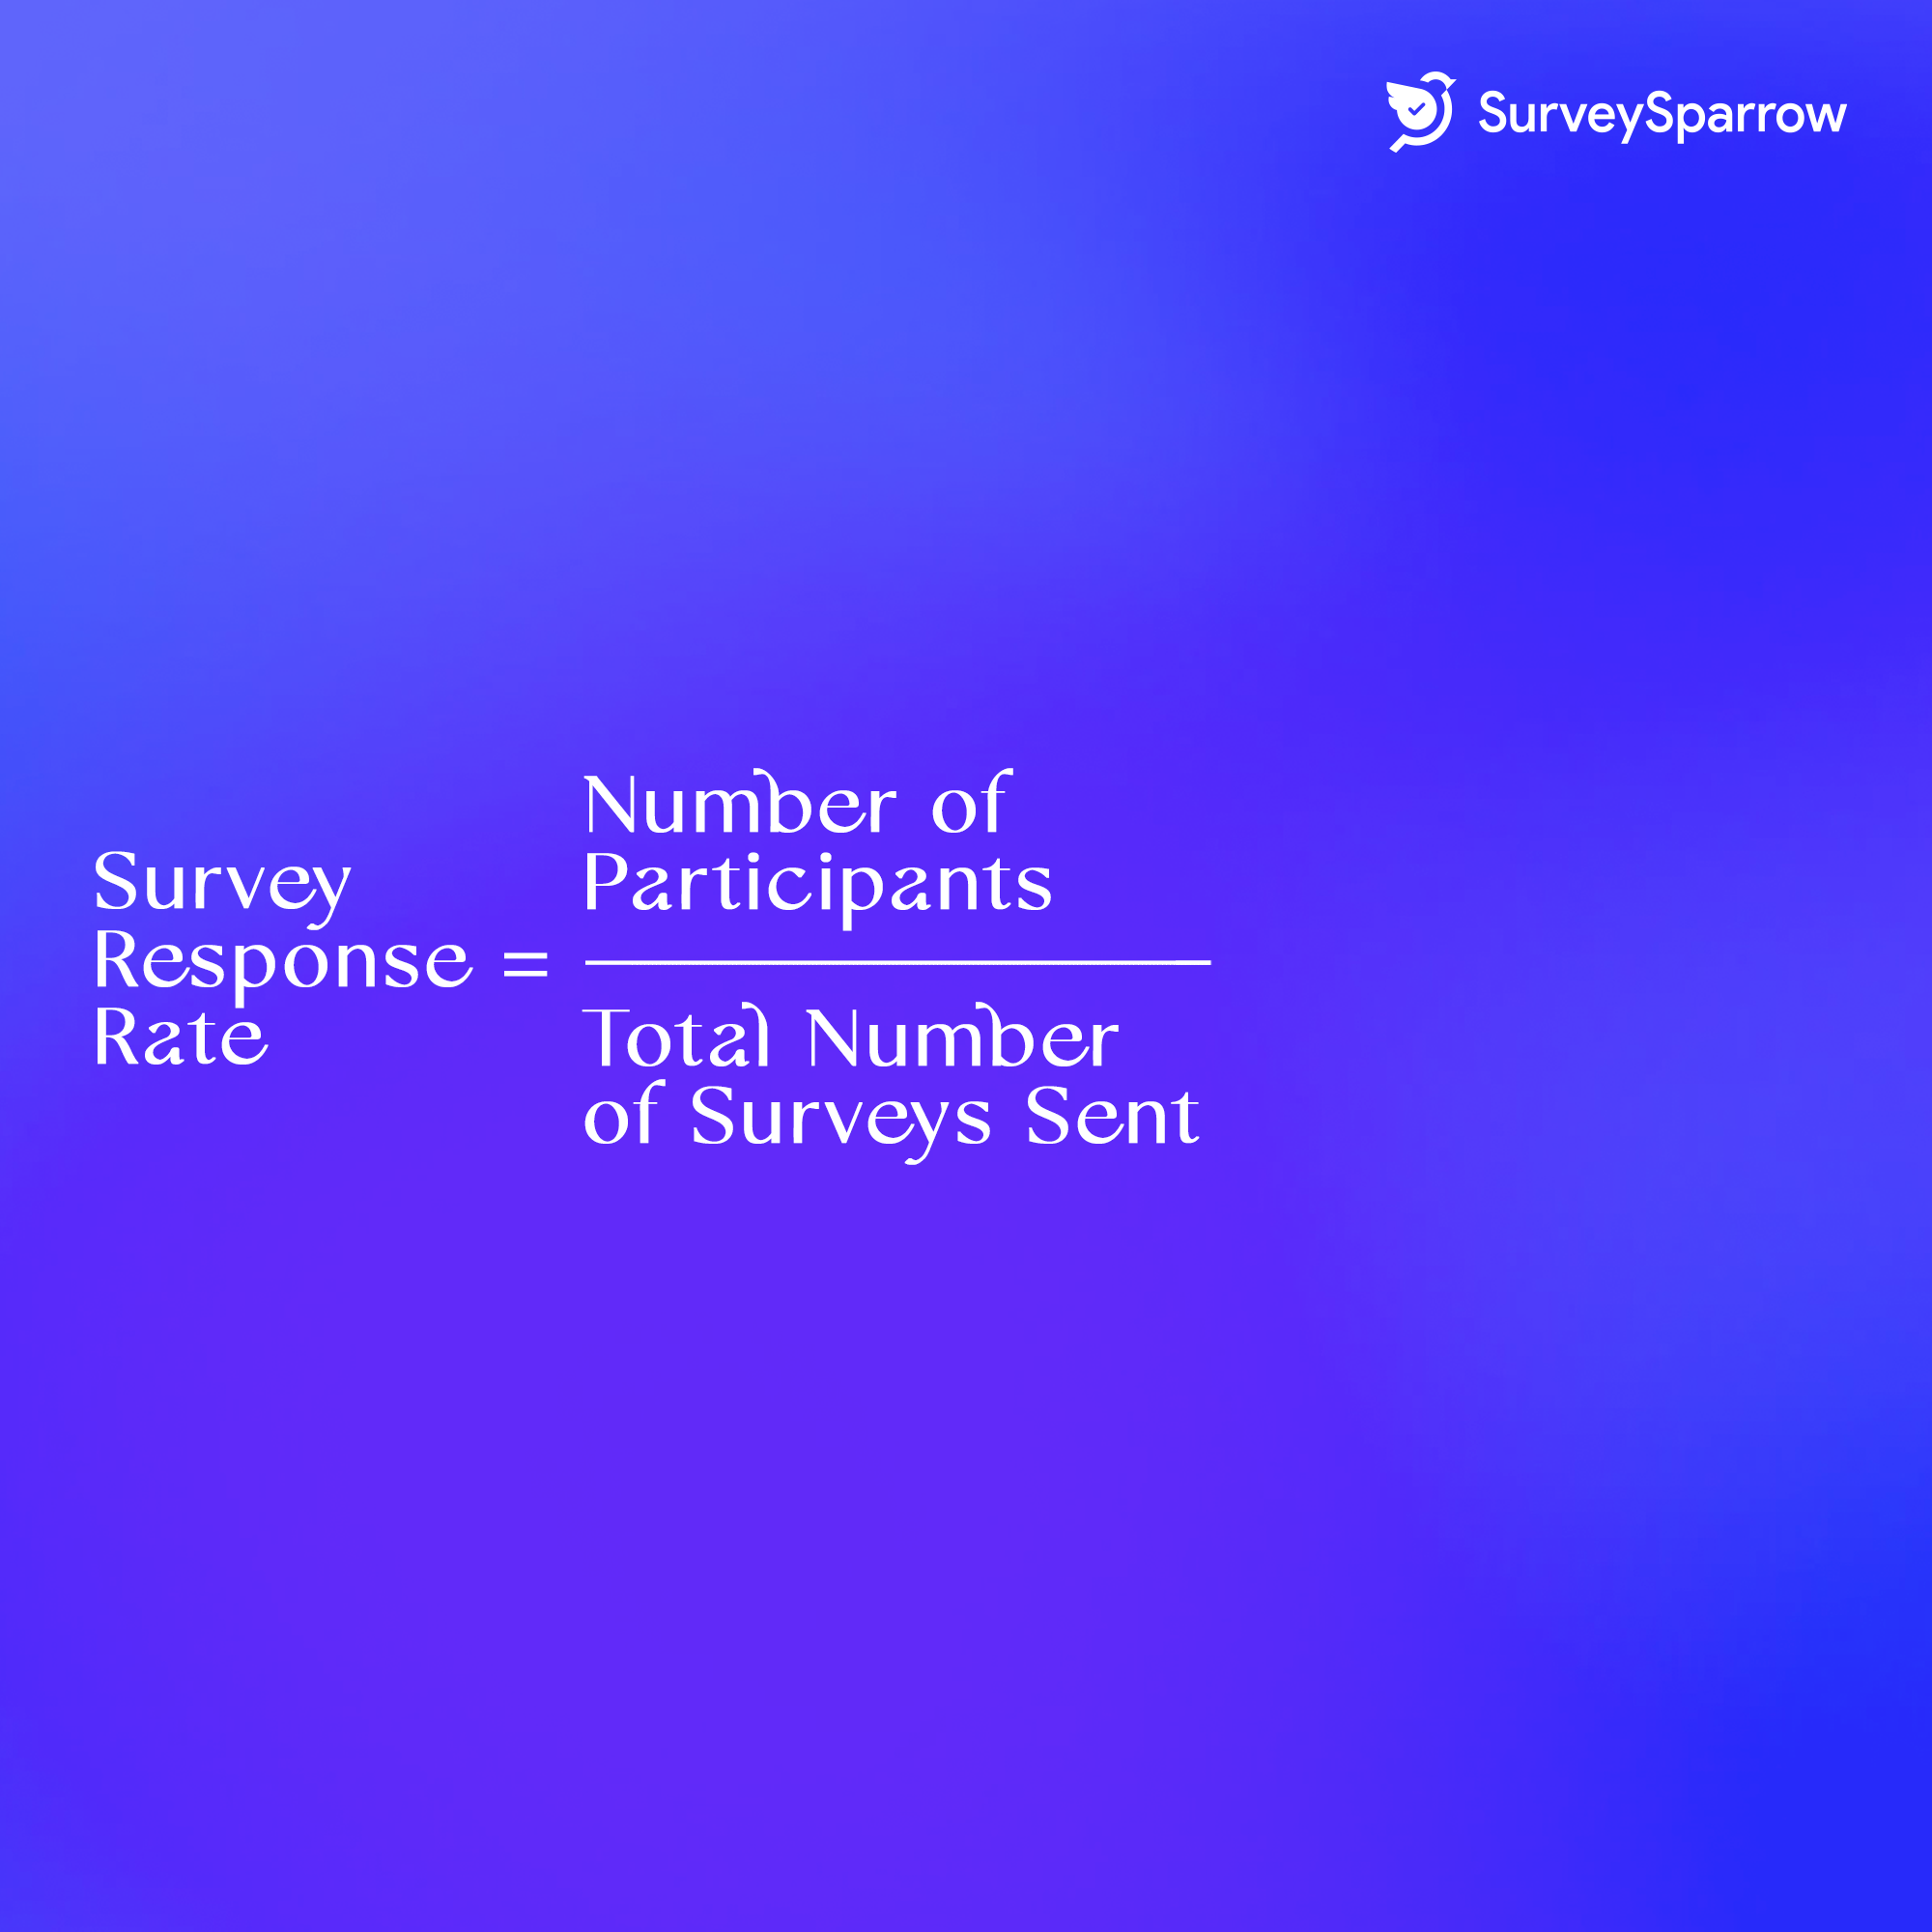 Survey response rate